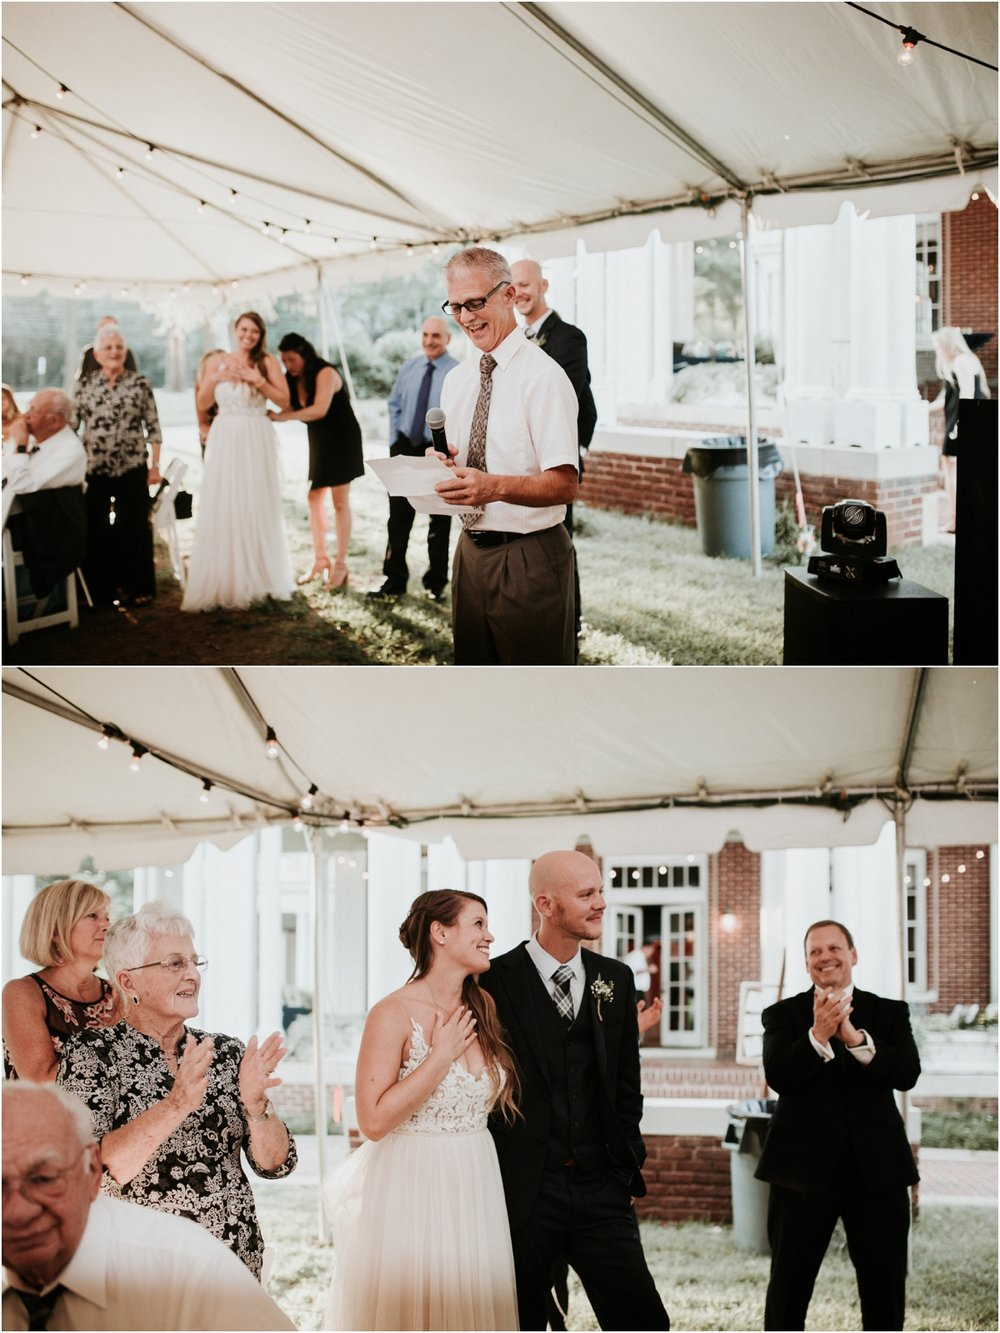 Stowe-manor-wedding-belmont-nc_0060.jpg